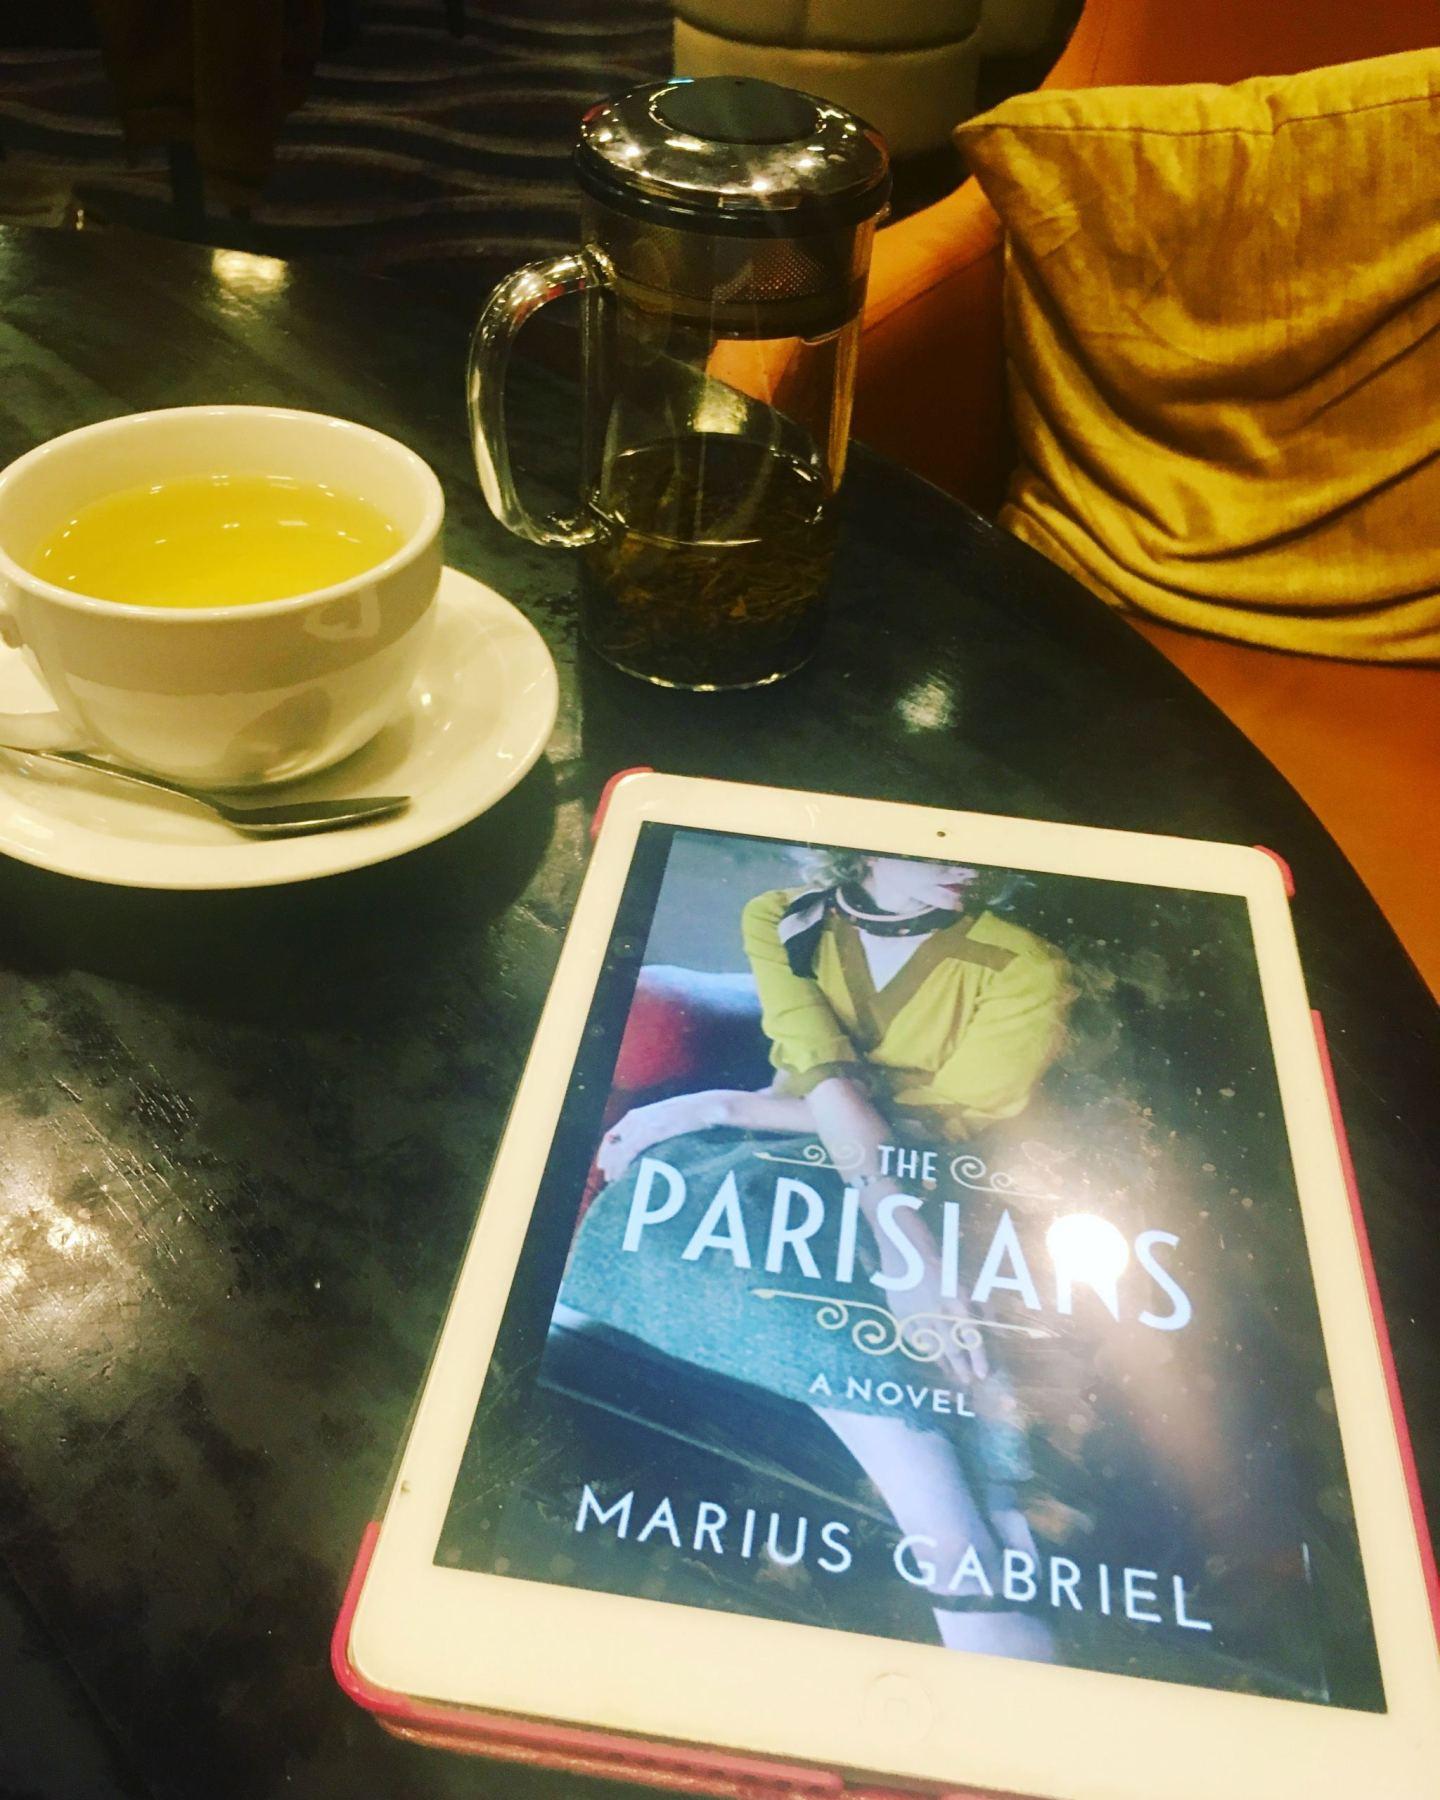 The Parisians – I couldn't put it down